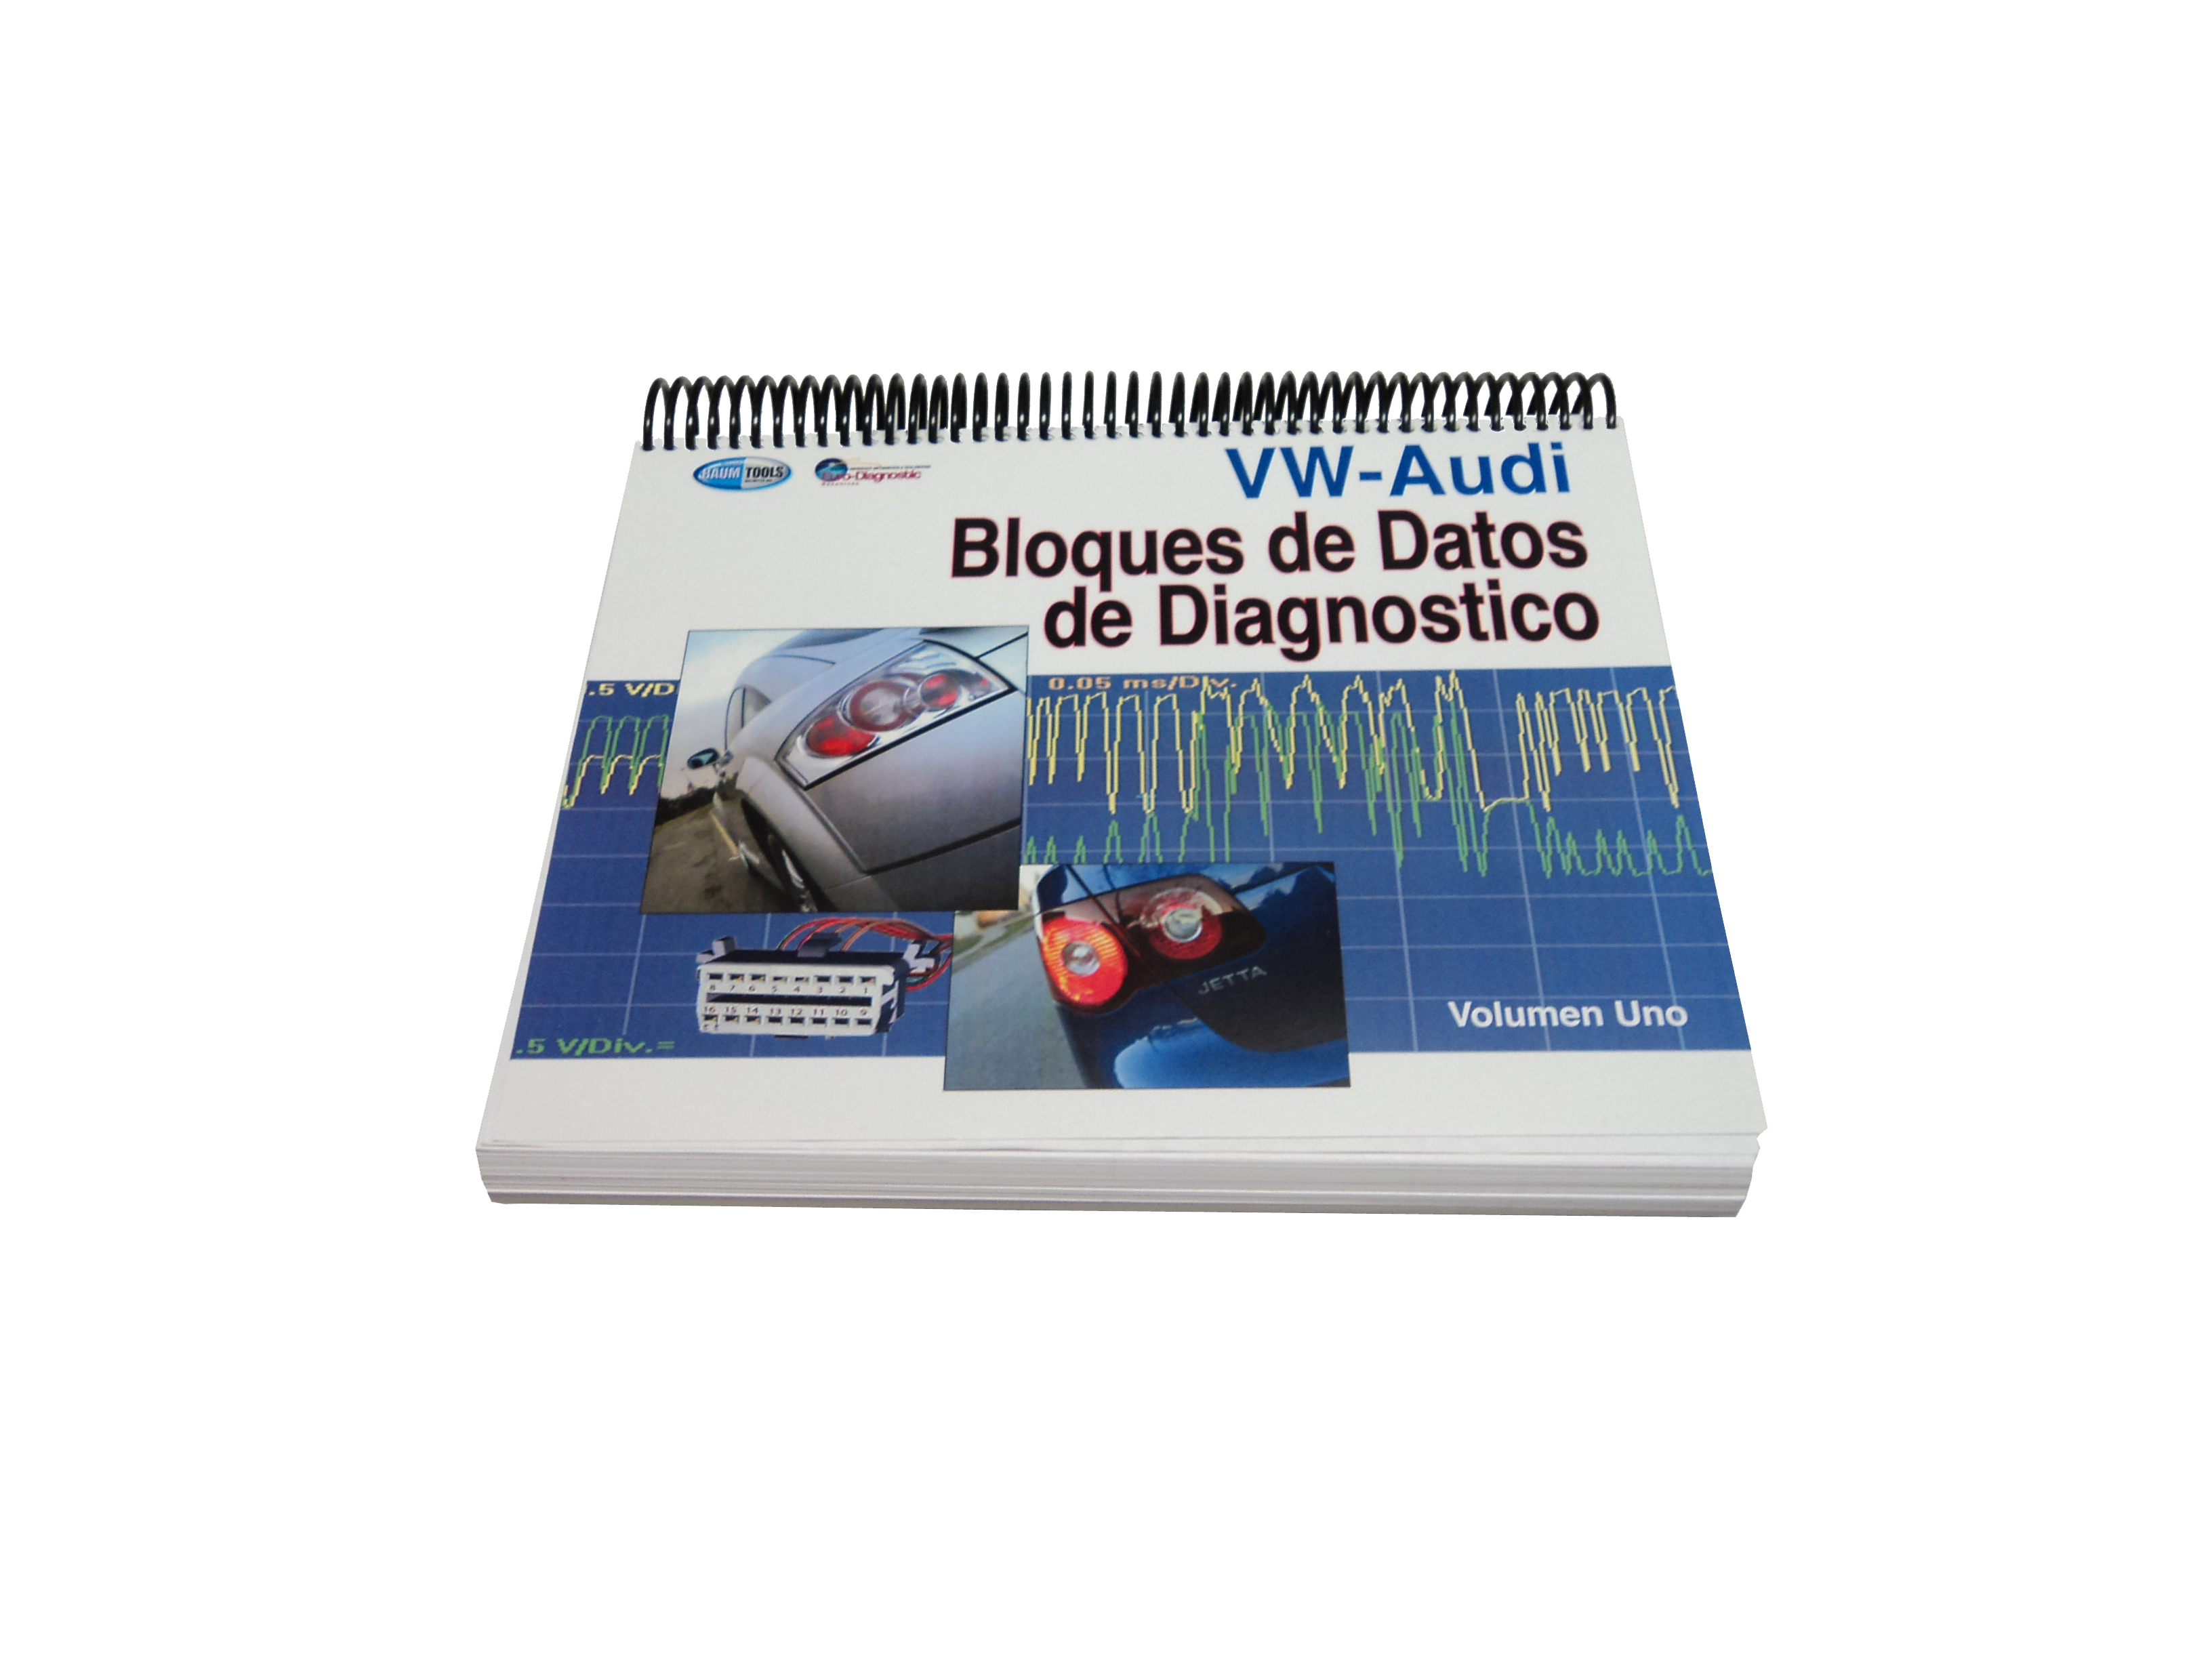 VW-Audi Bloques de Datos de Diagnostico, Volumen Uno